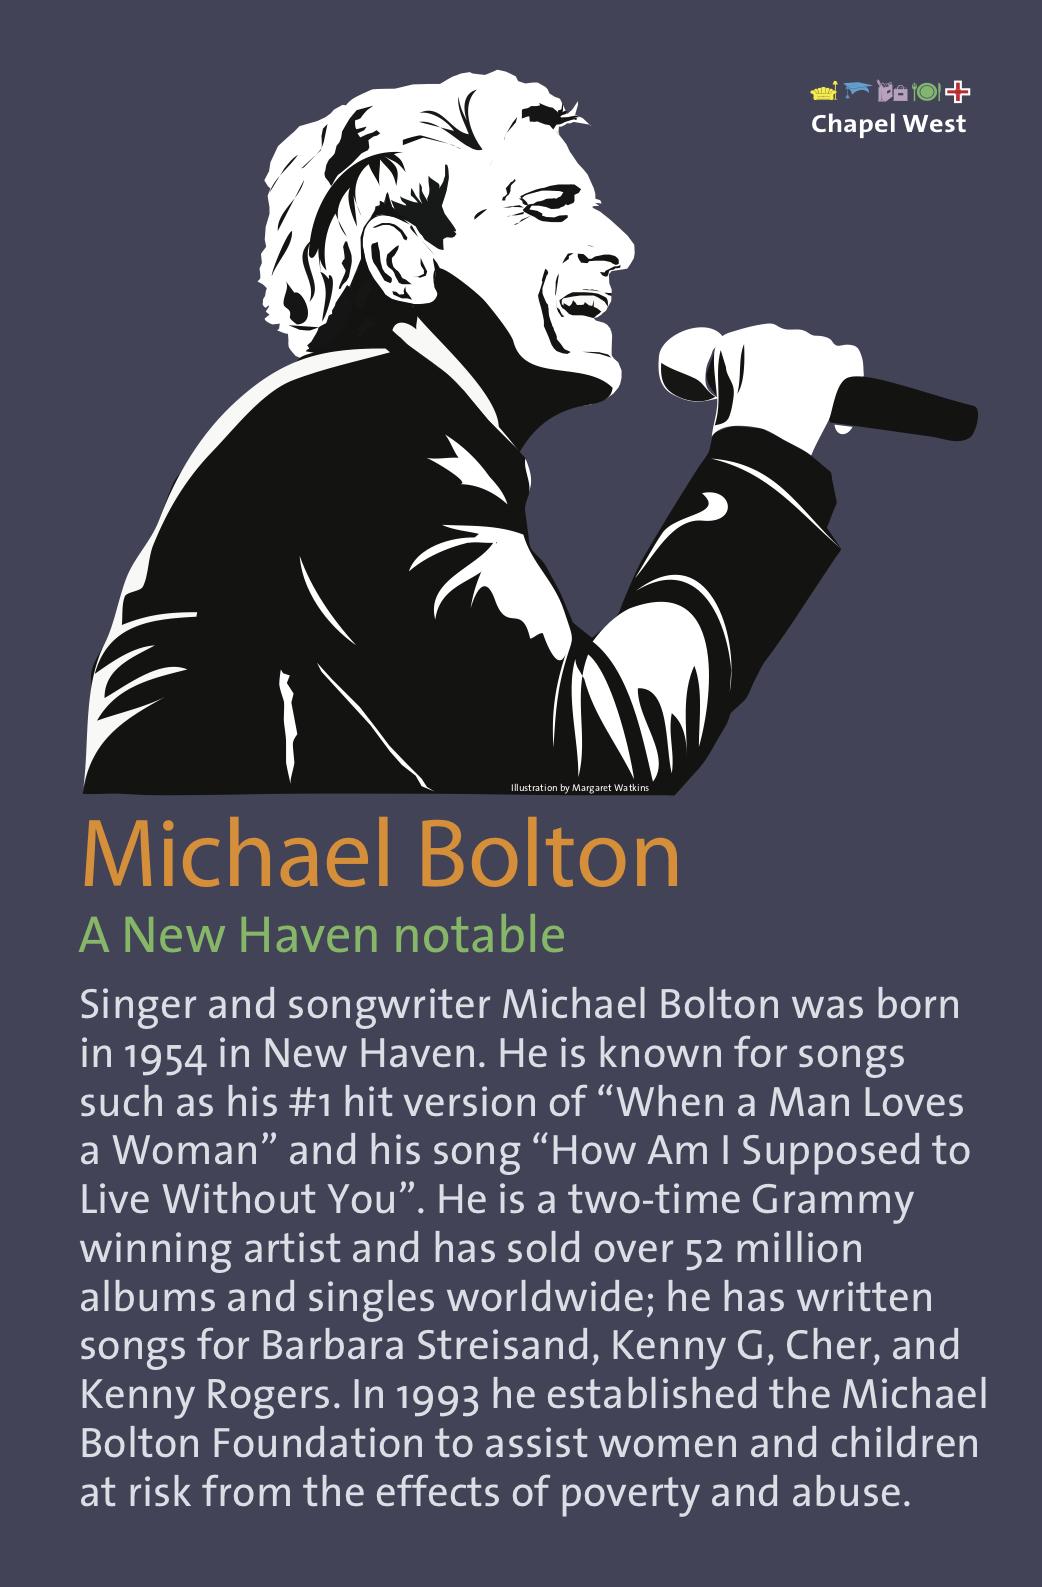 Michael Bolton Banner